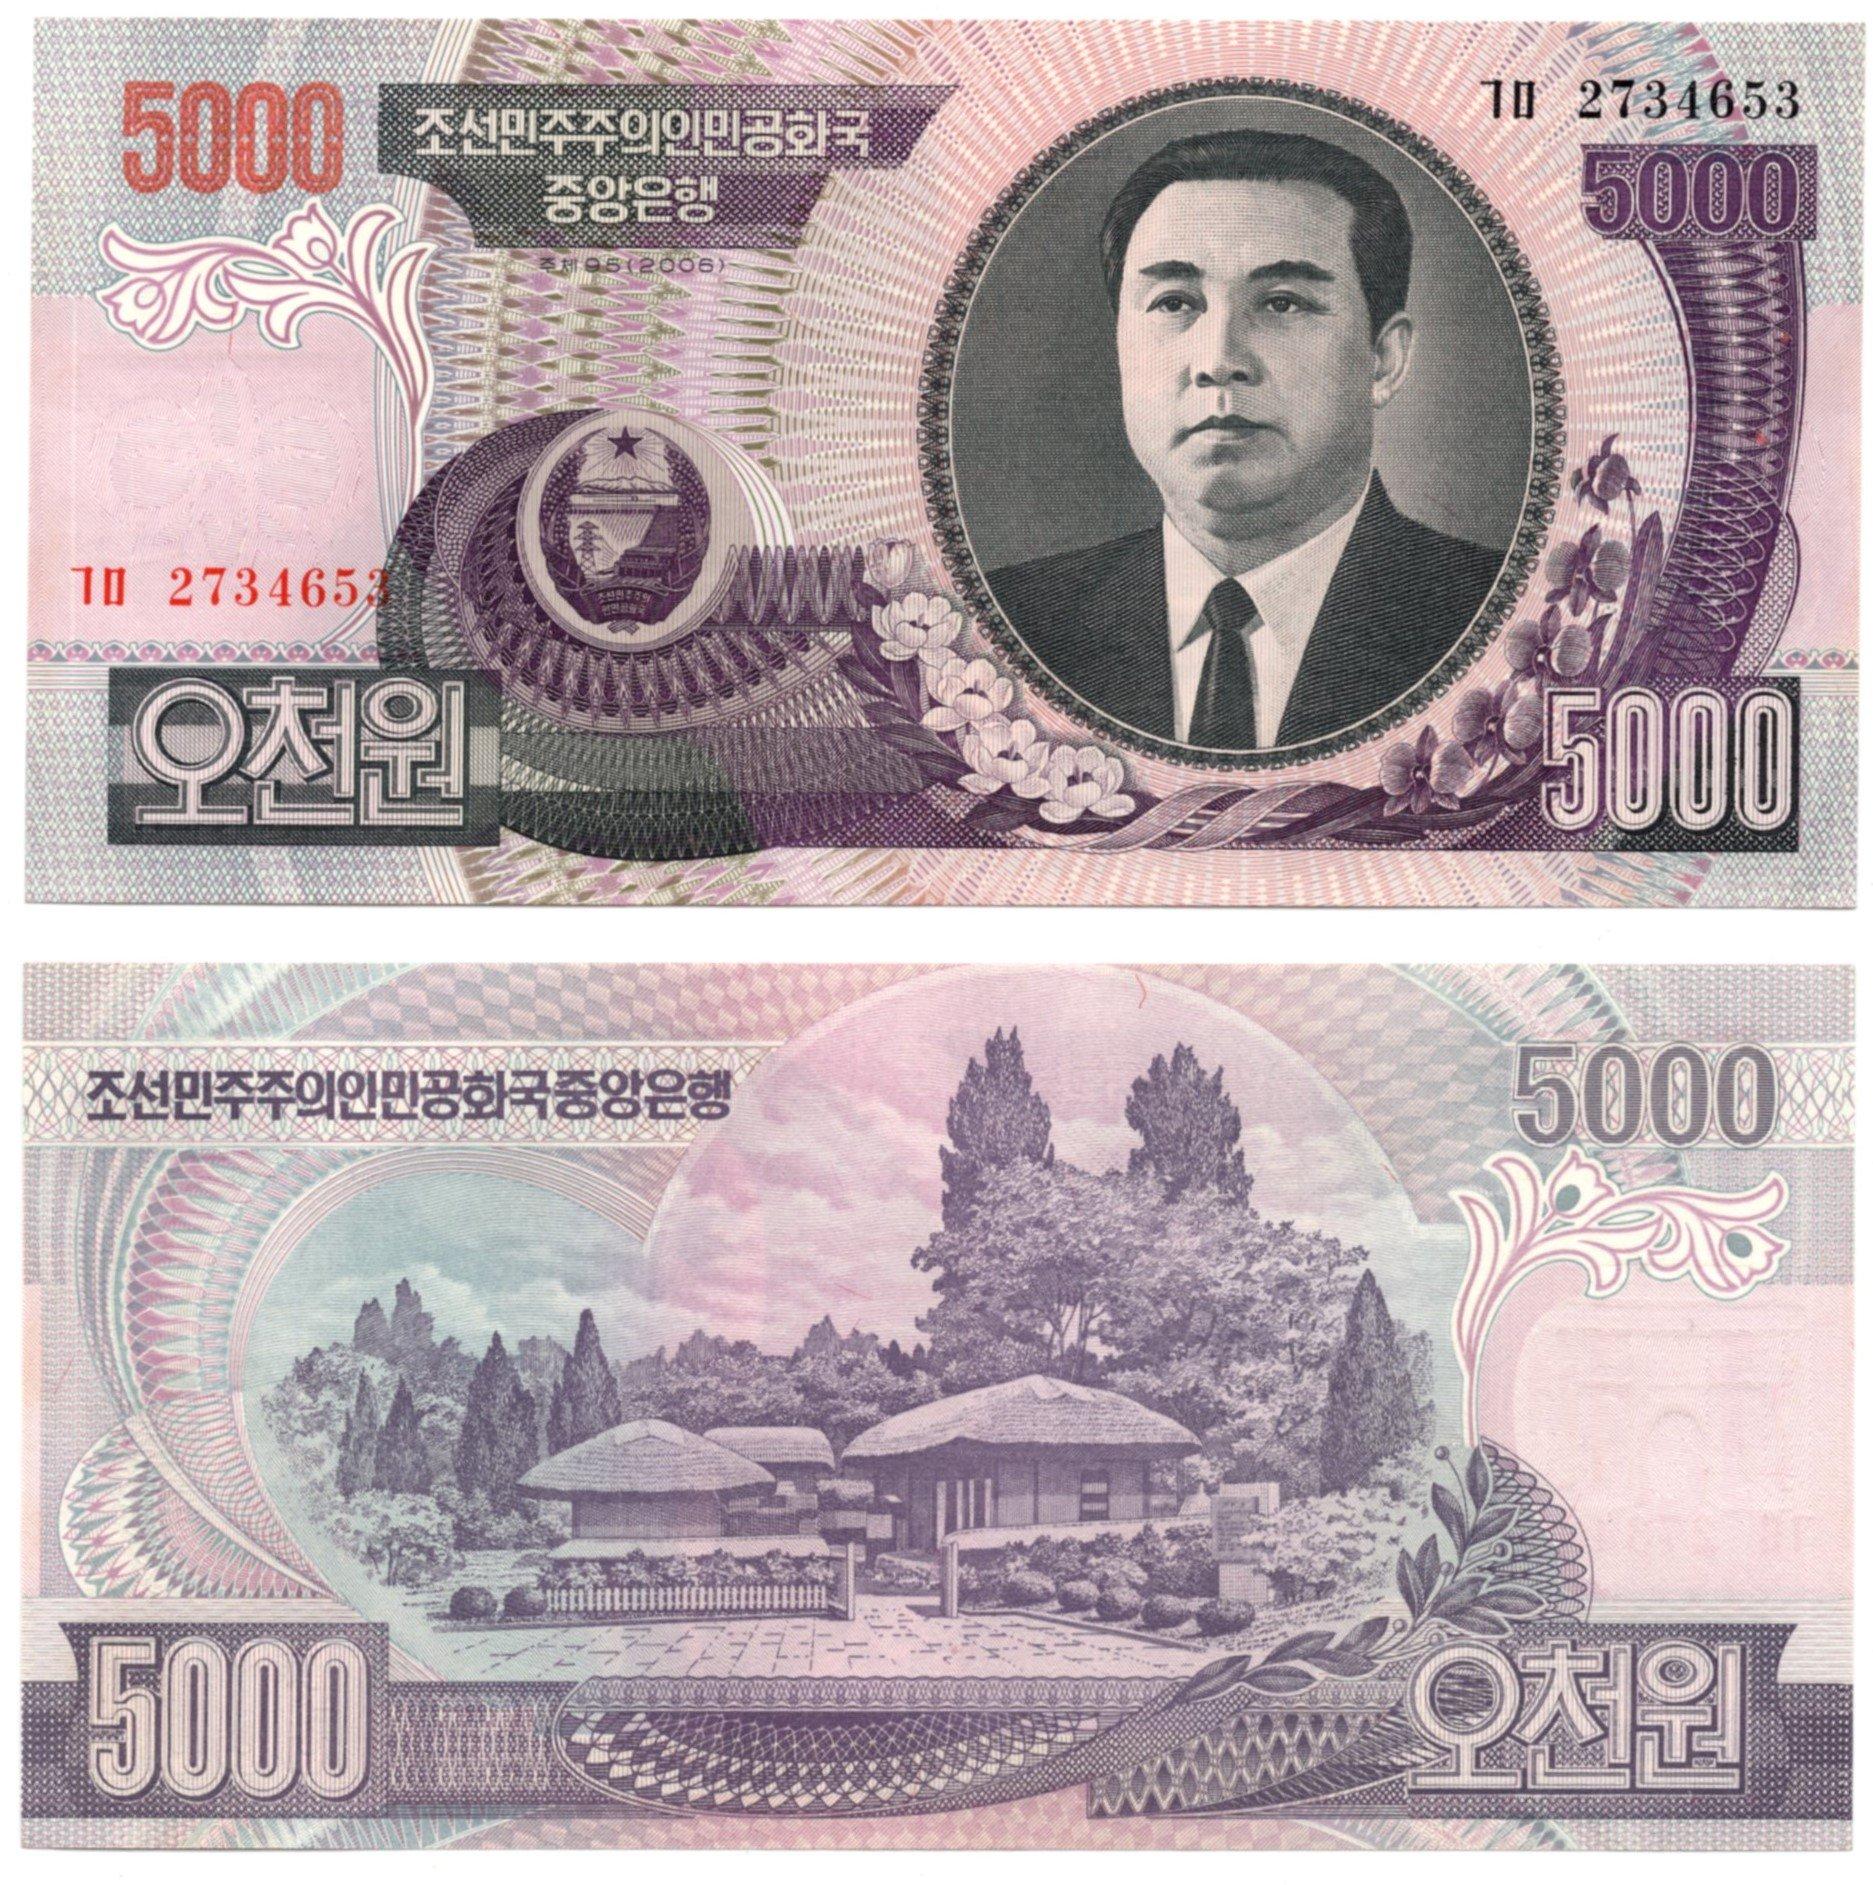 NKorea 5000 won